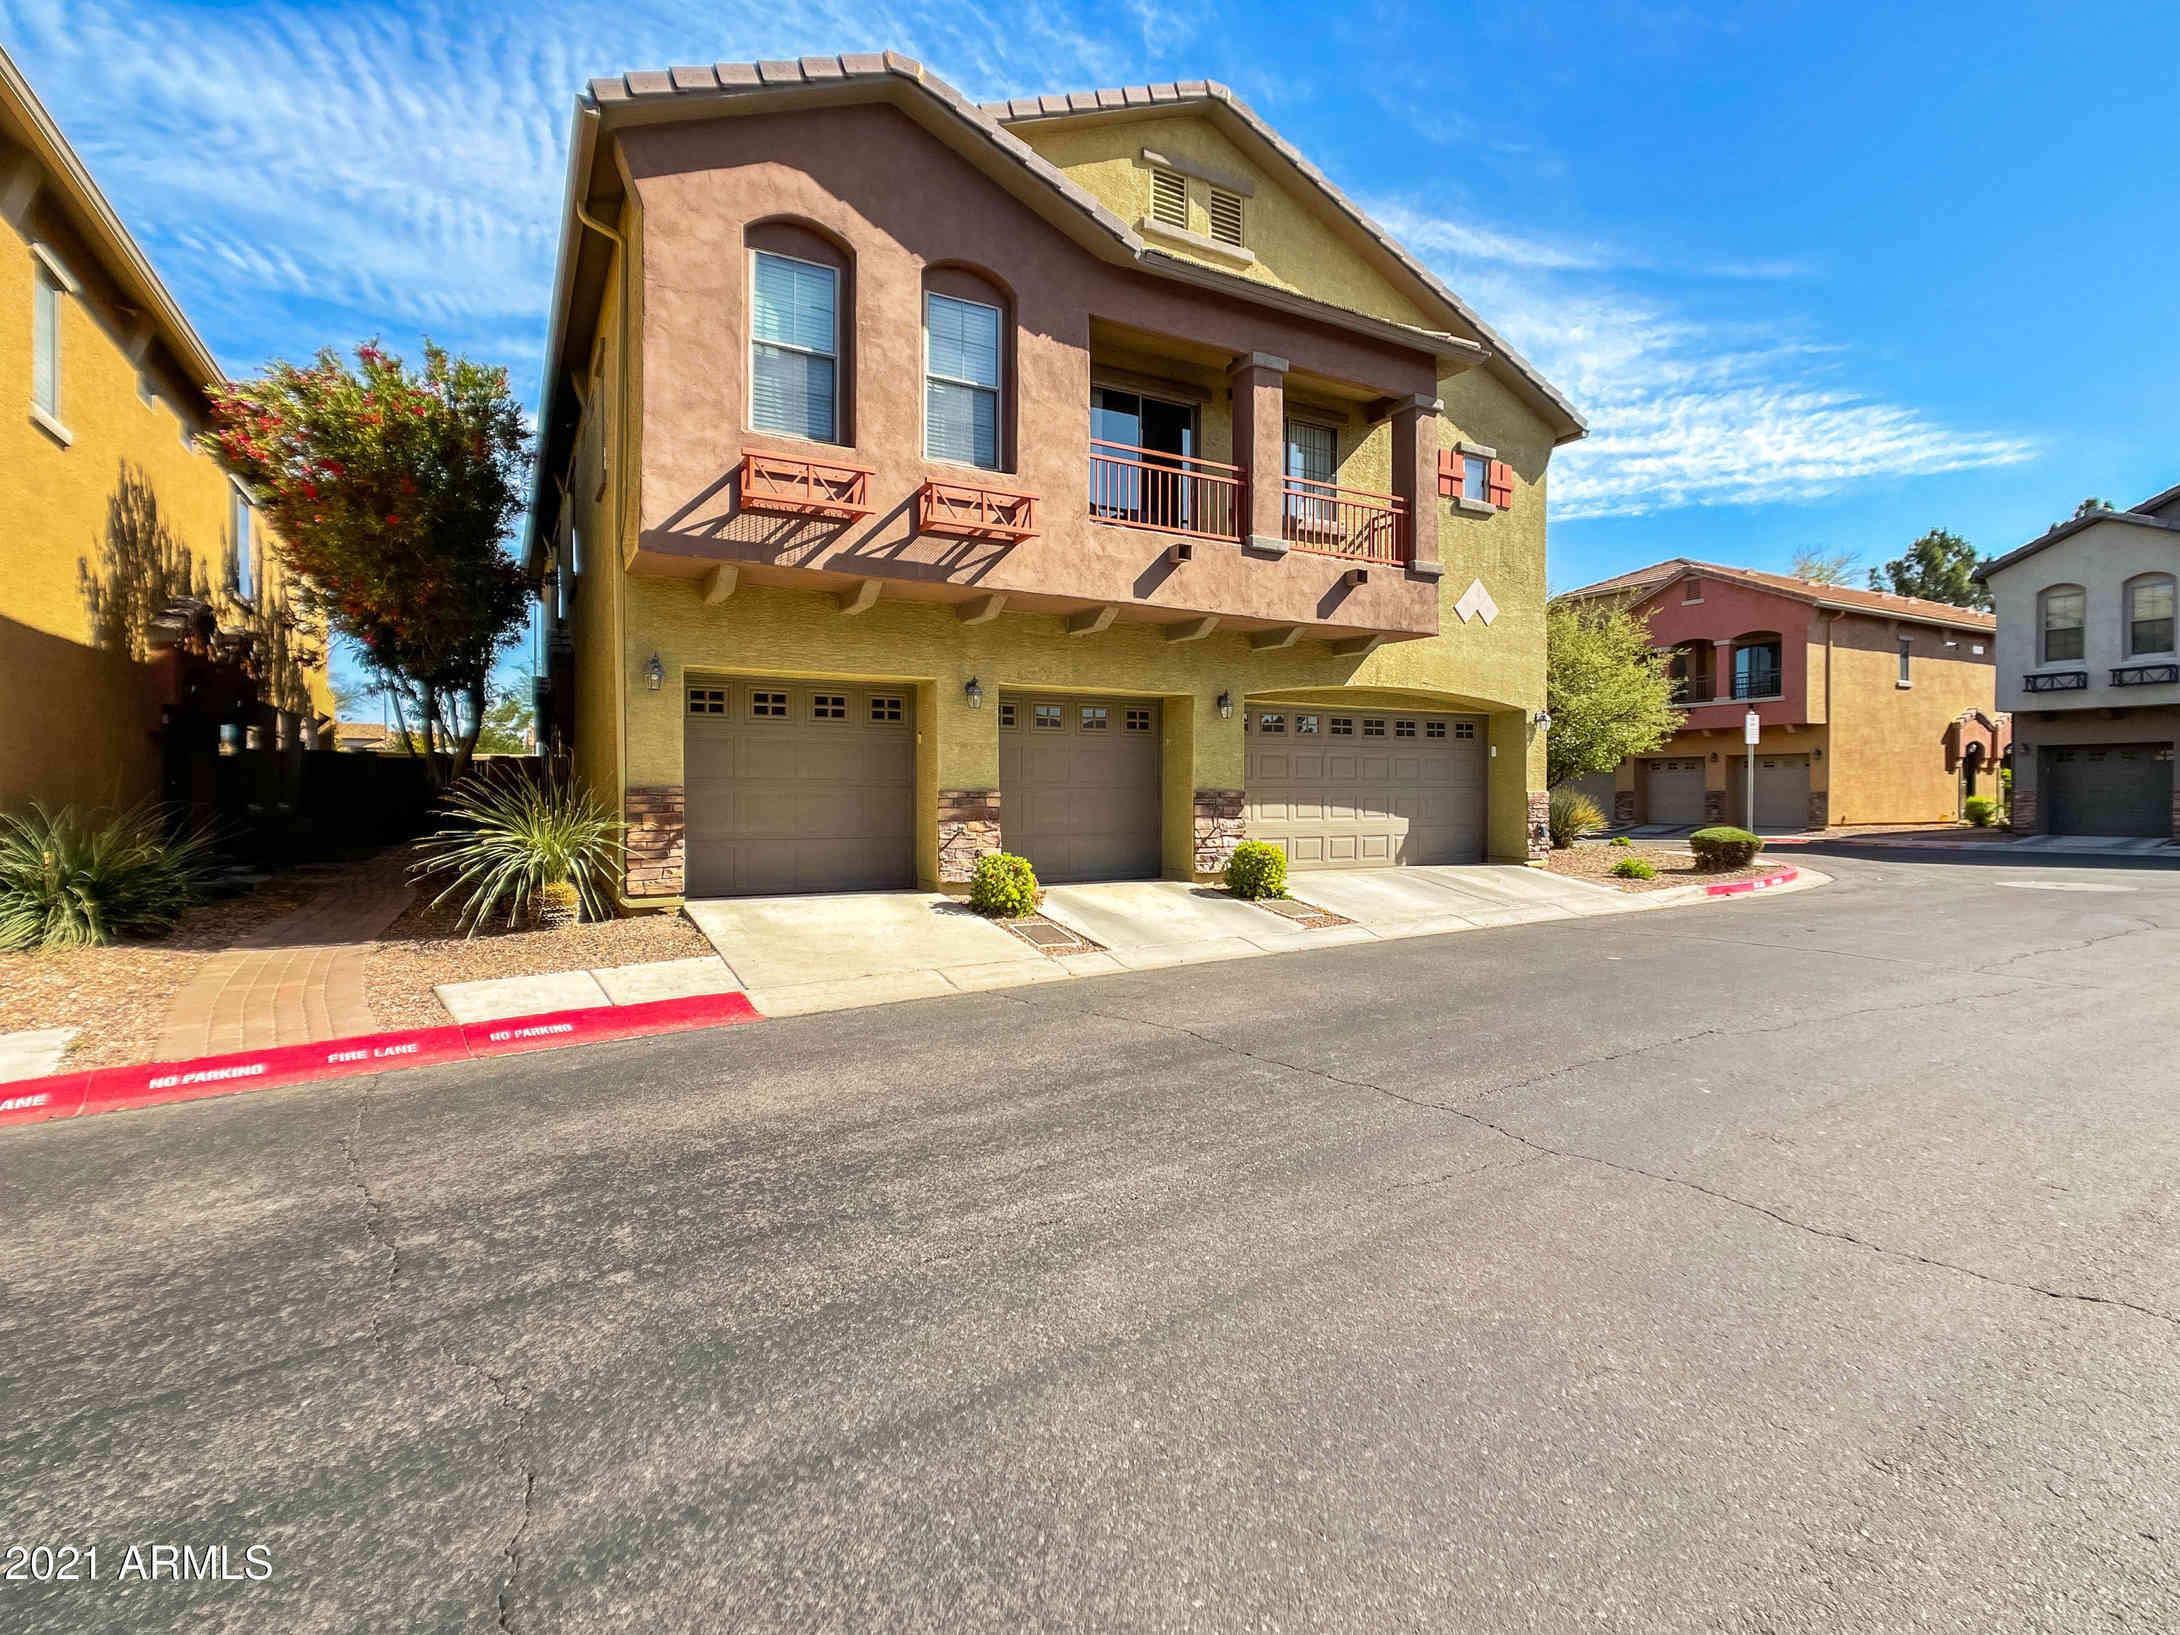 2024 S BALDWIN -- #10, Mesa, AZ, 85209,